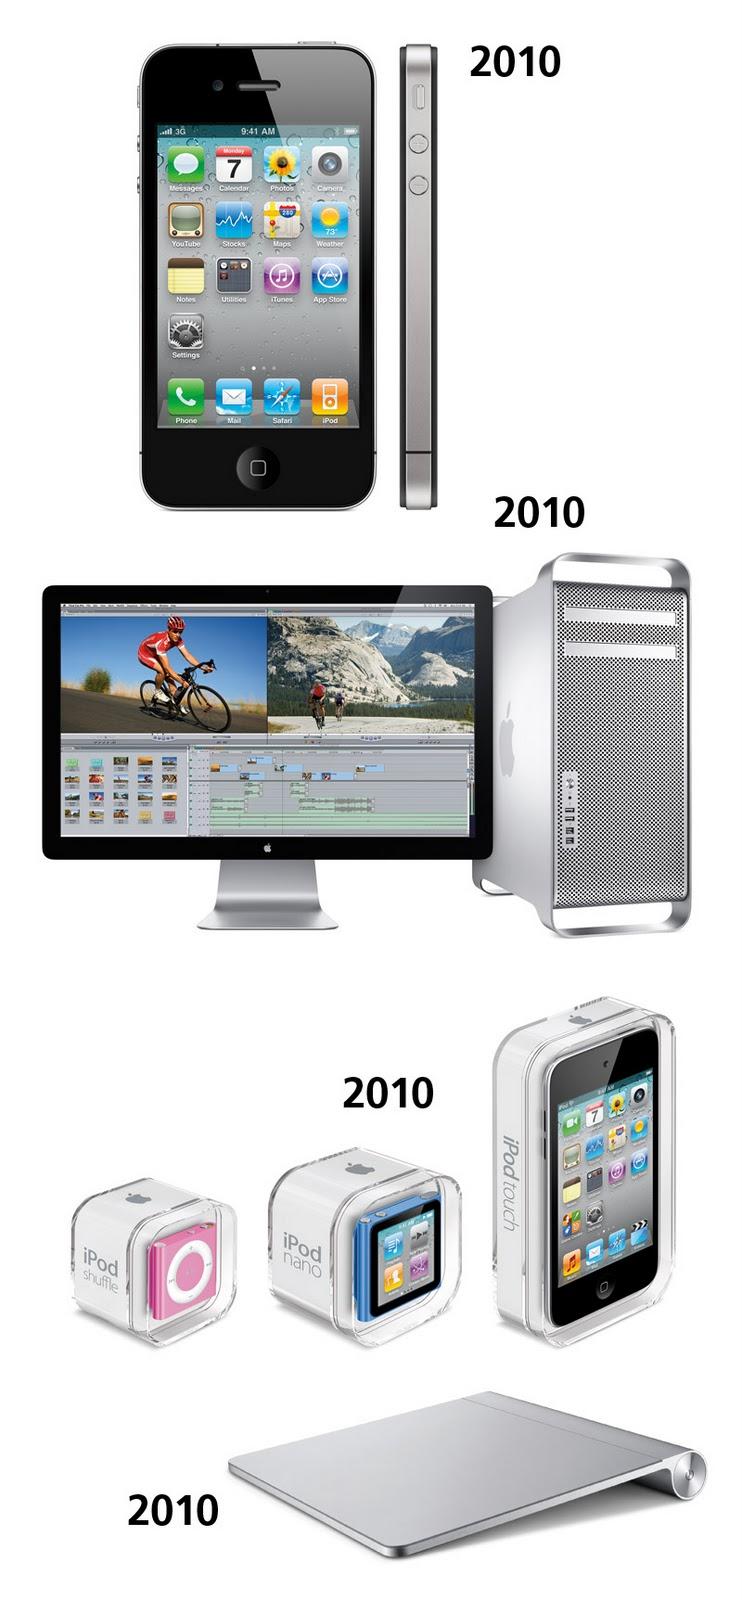 prodotti-apple-5.jpg